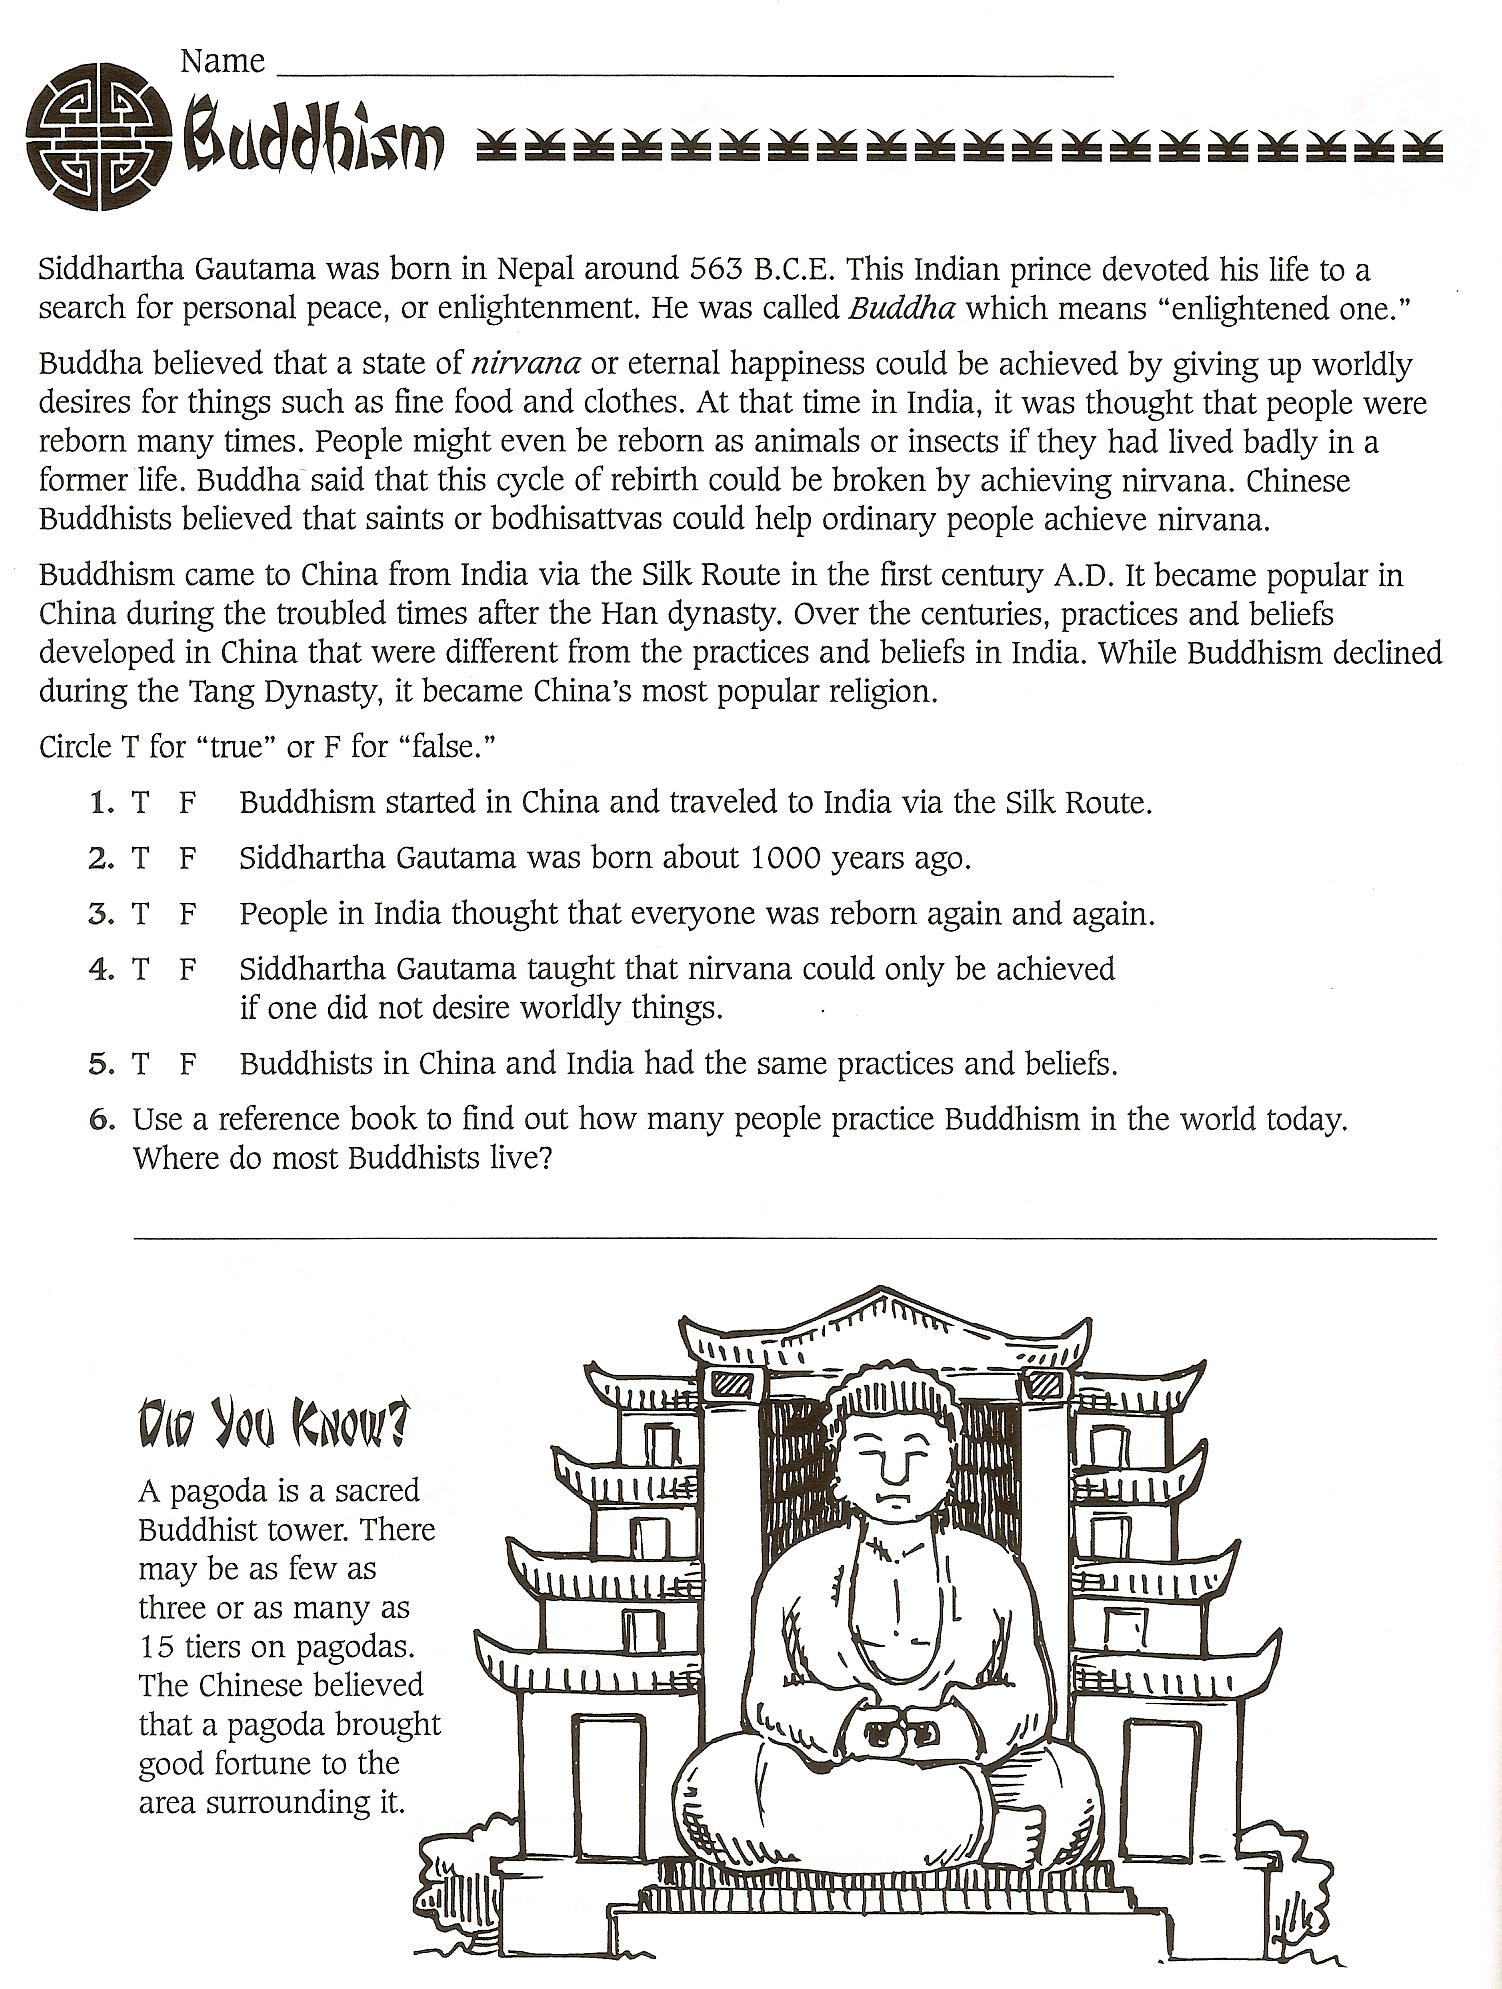 Buddhism Worksheet 6th Grade